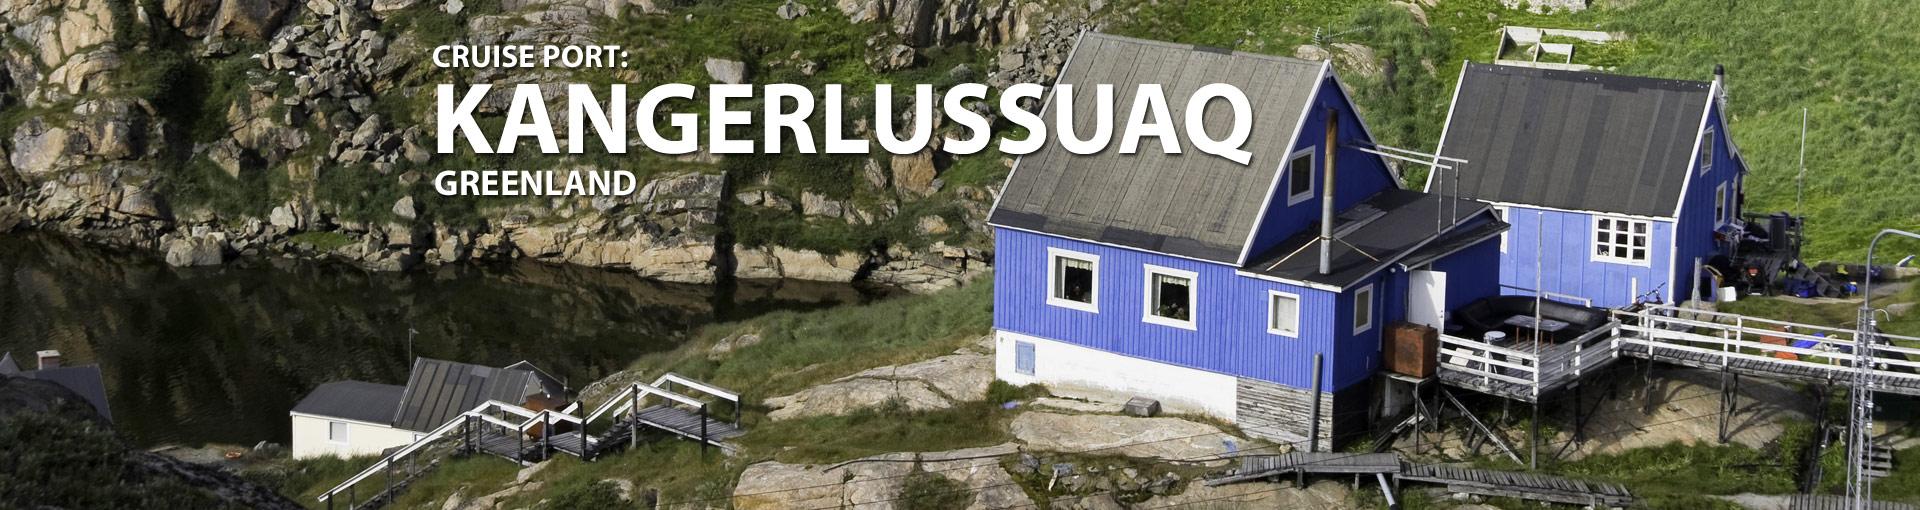 Cruises from Kangerlussuaq, Greenland